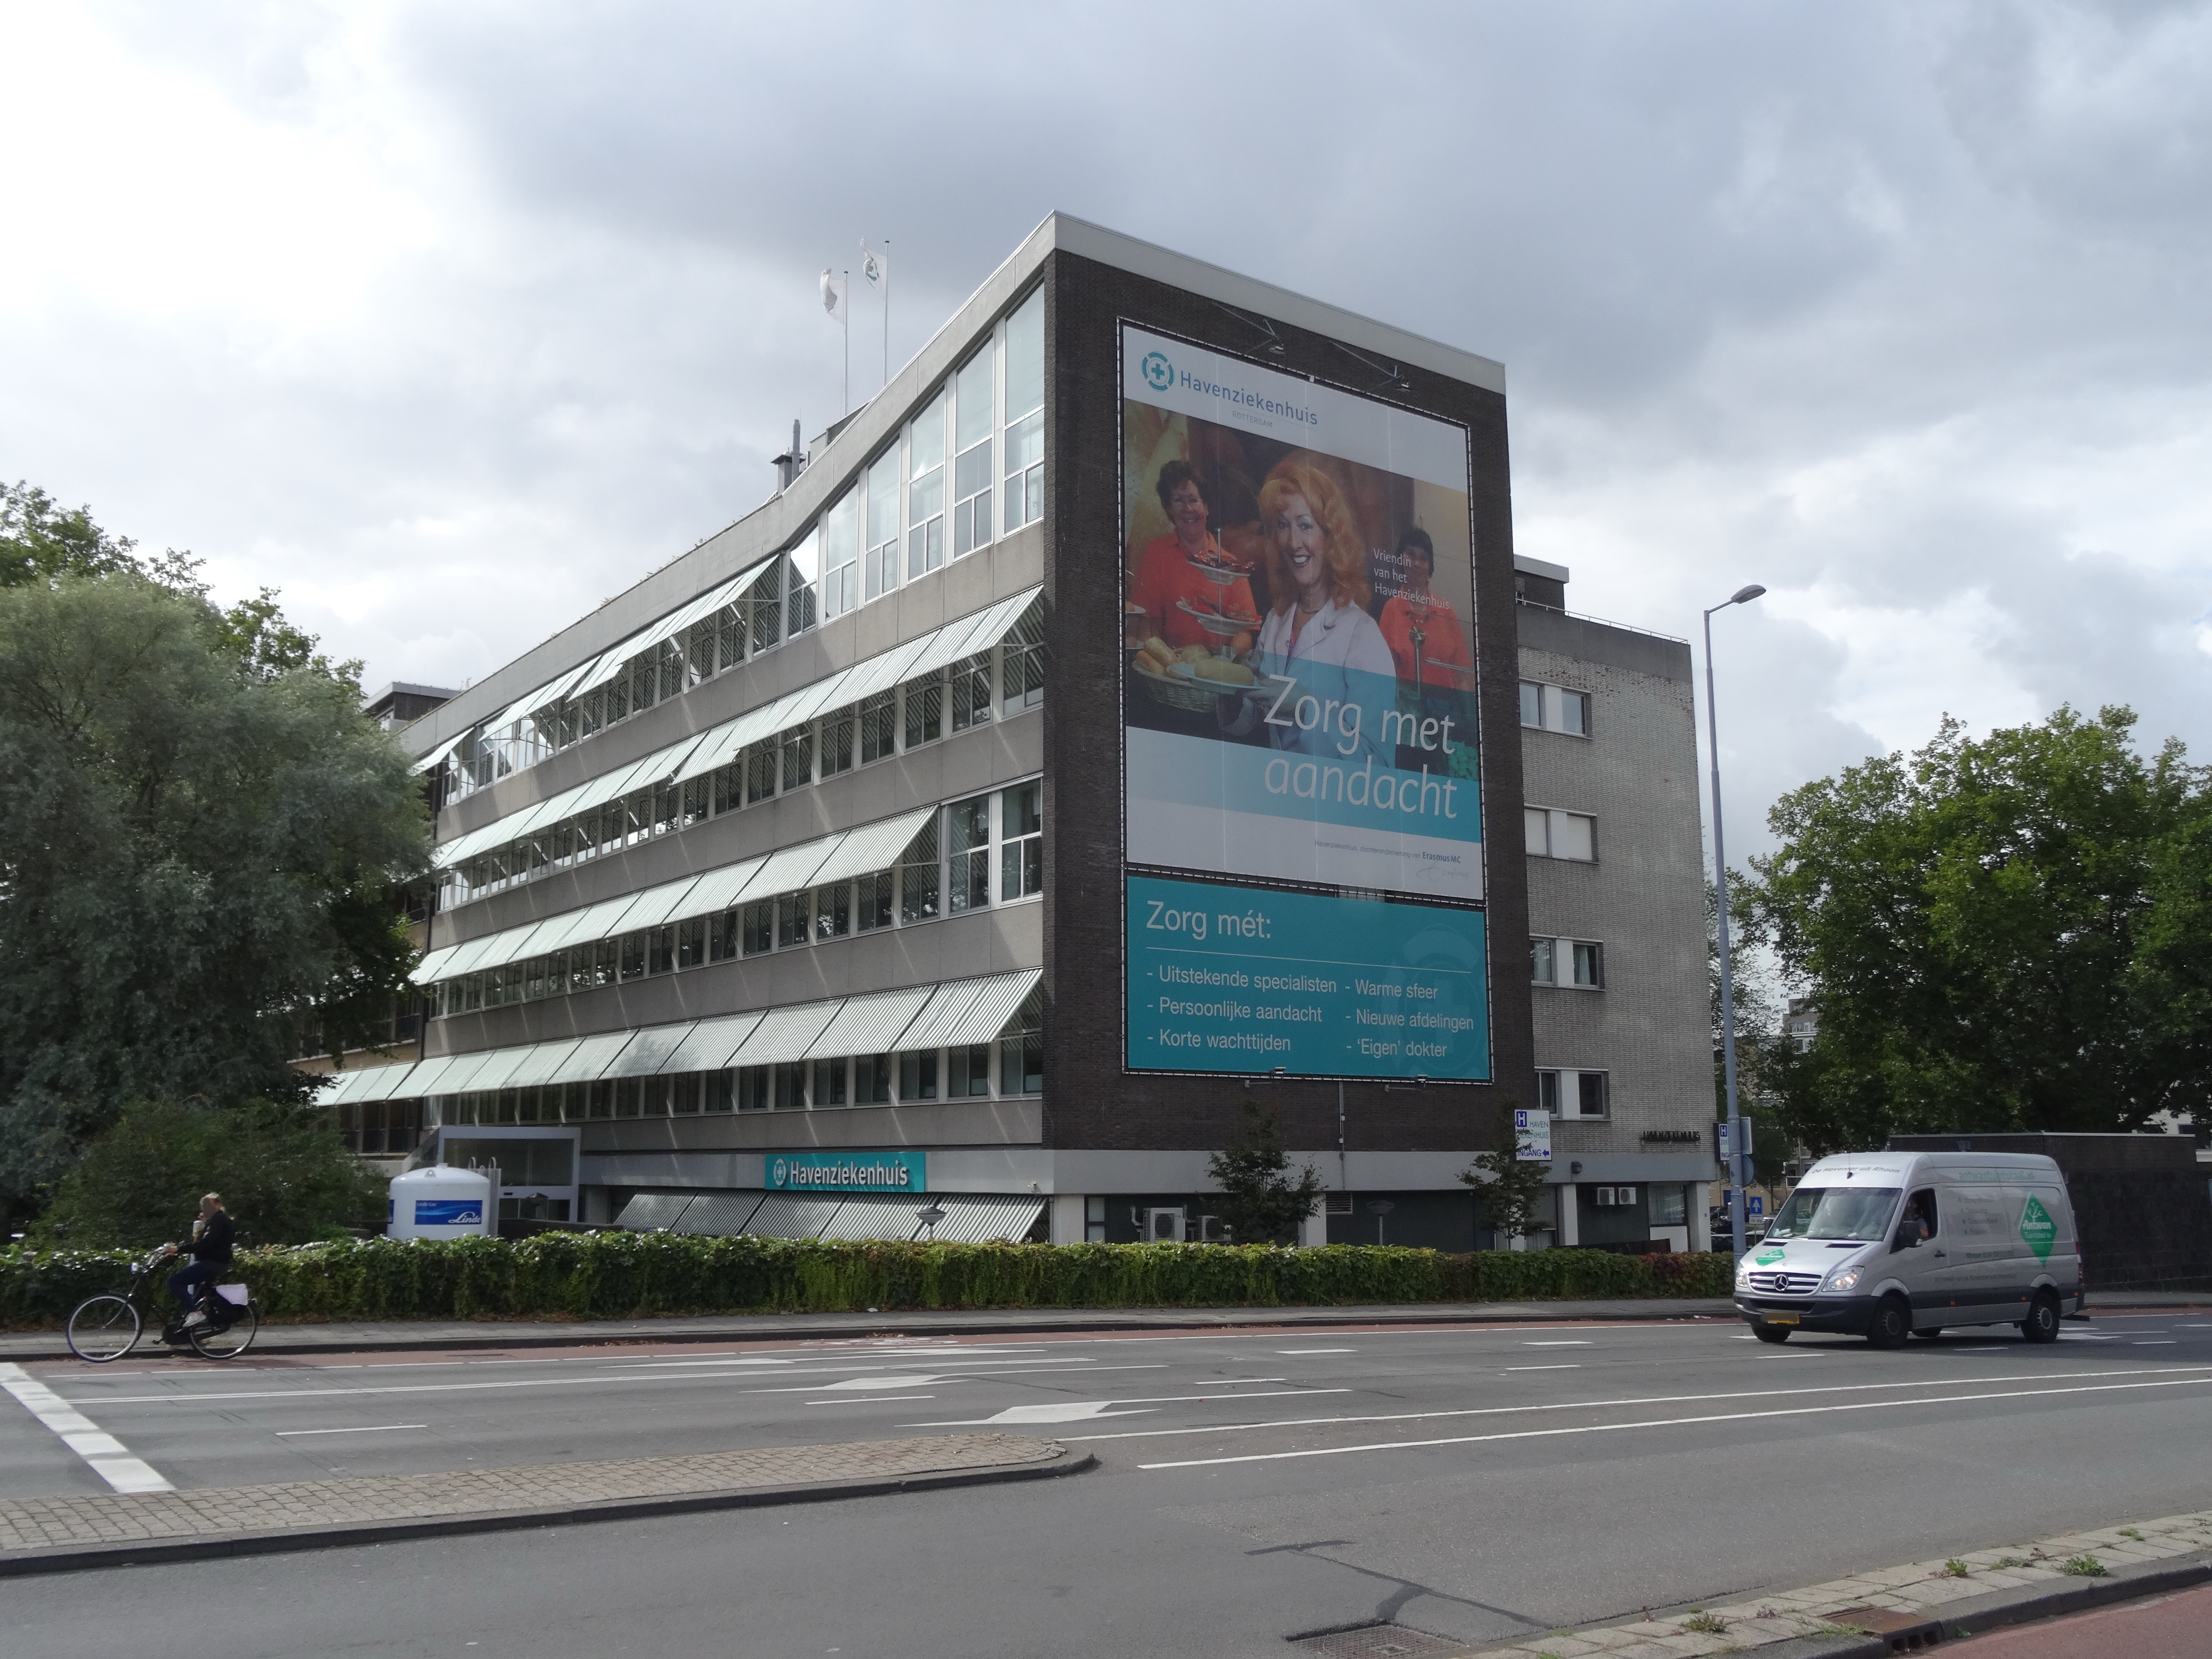 Havenziekenhuis - Wikipedia